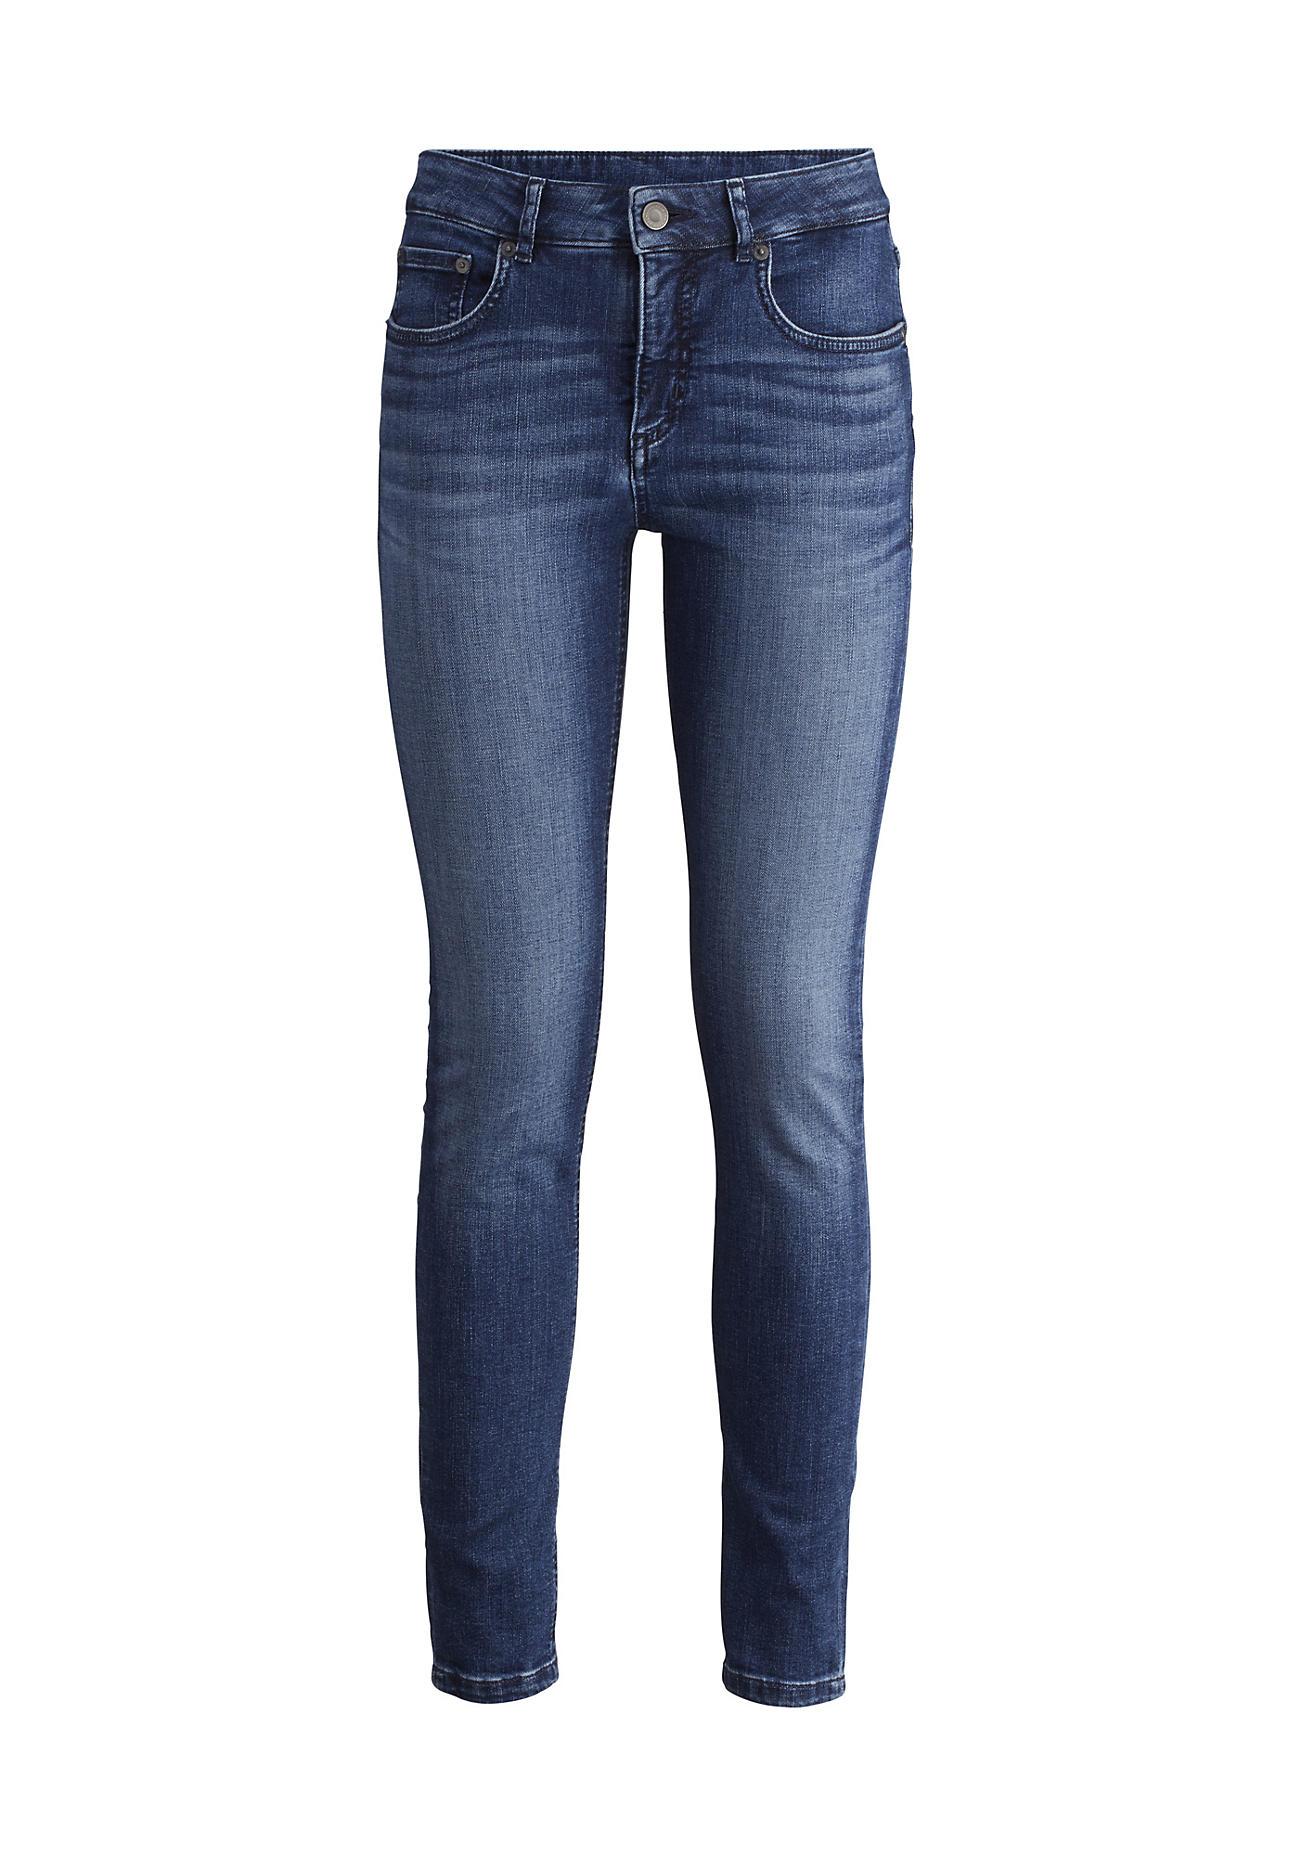 hessnatur Damen Jeans Lina Skinny Fit aus Bio-Denim – blau – Größe 26/32